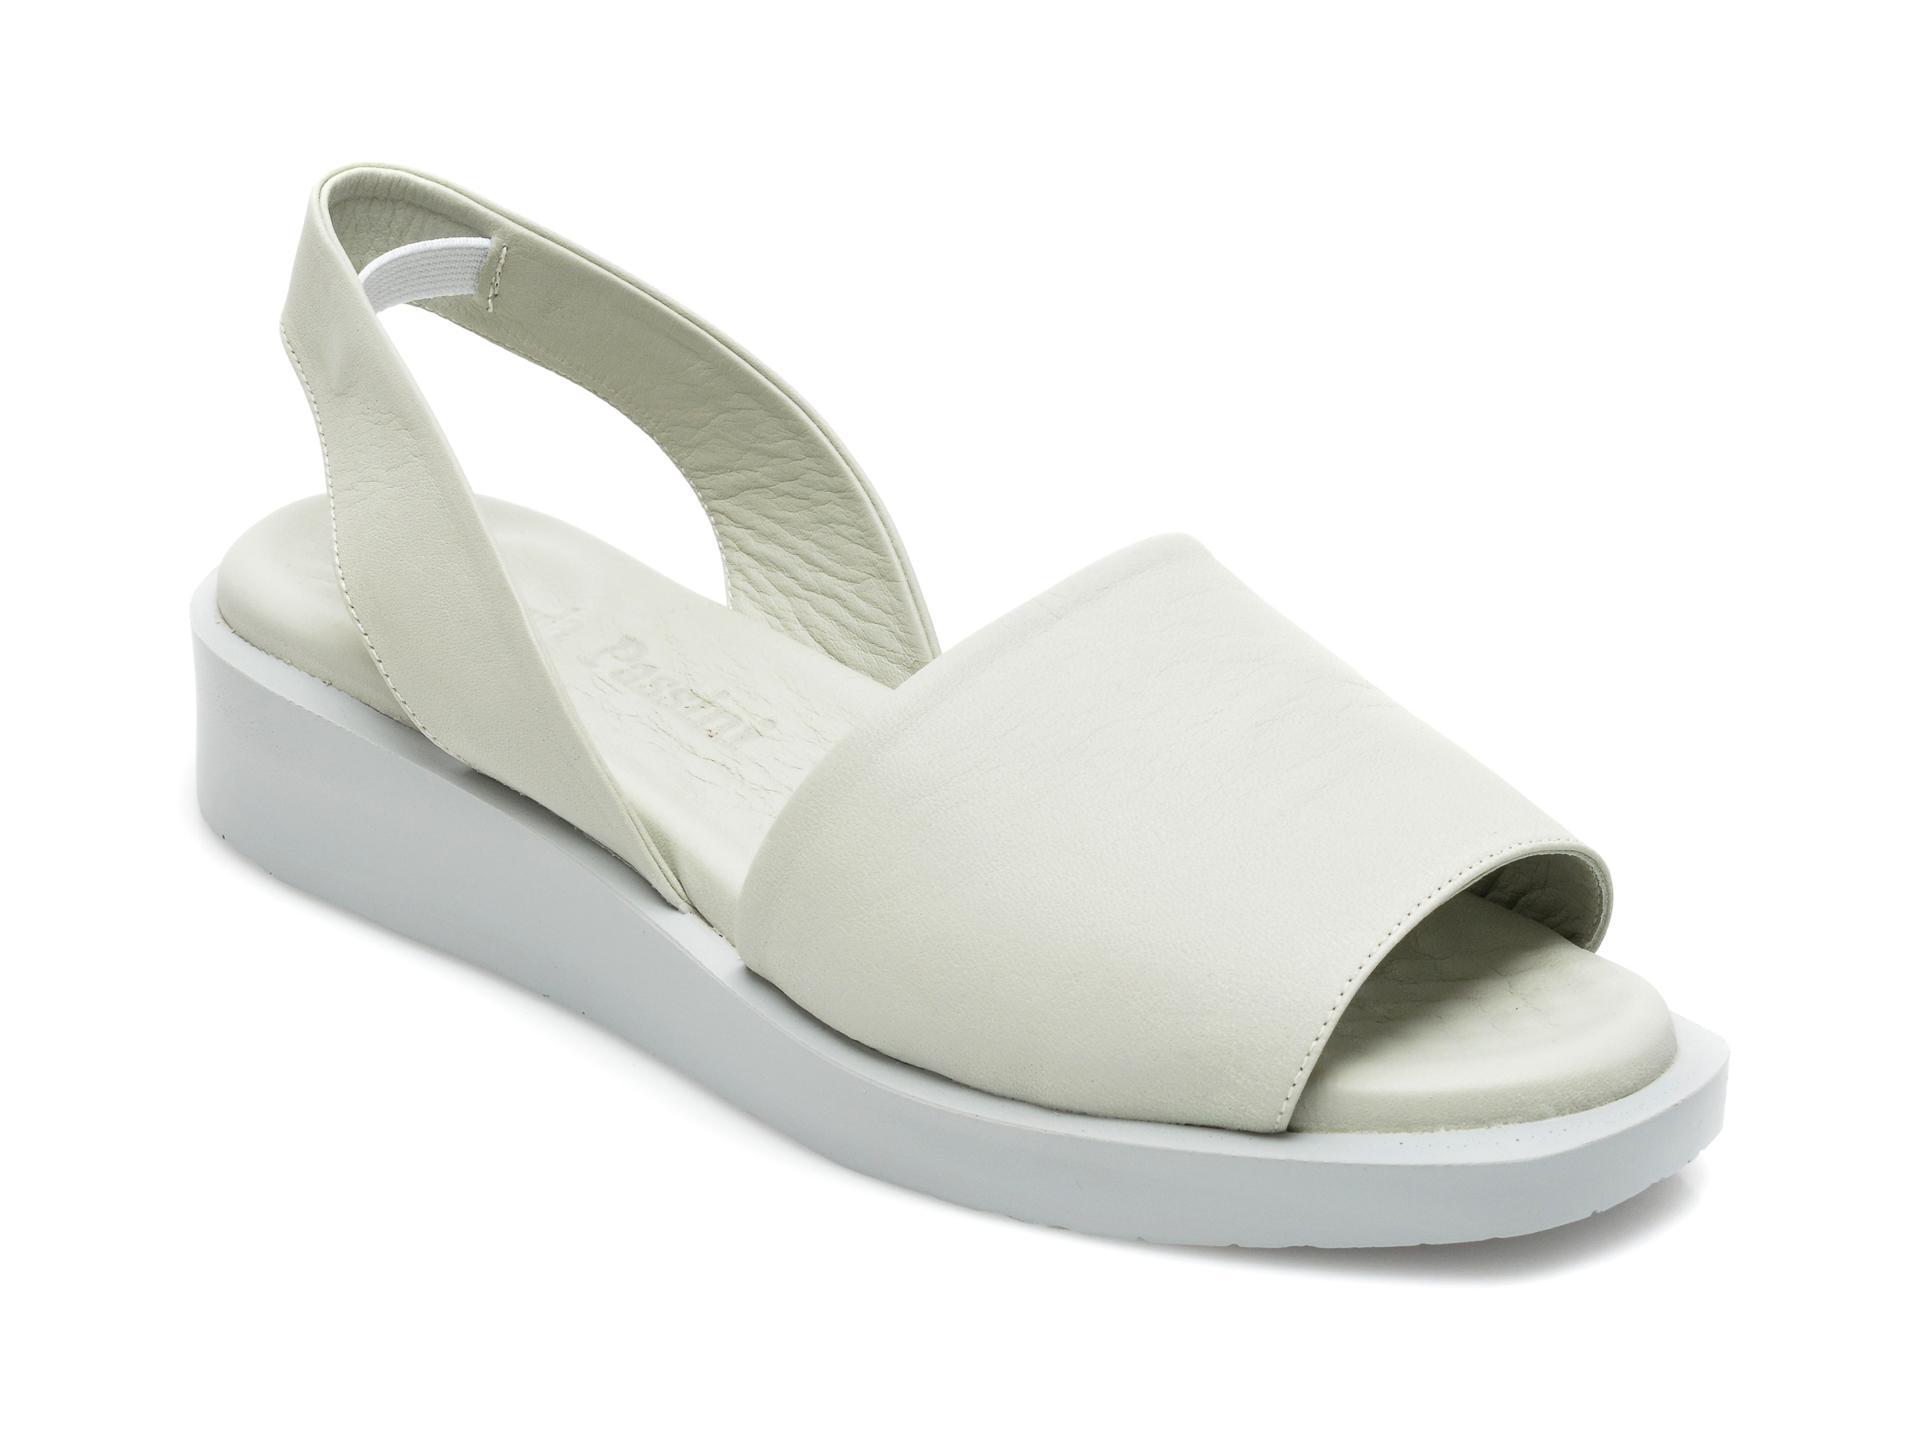 Sandale FLAVIA PASSINI verzi, 1582018, din piele naturala imagine otter.ro 2021